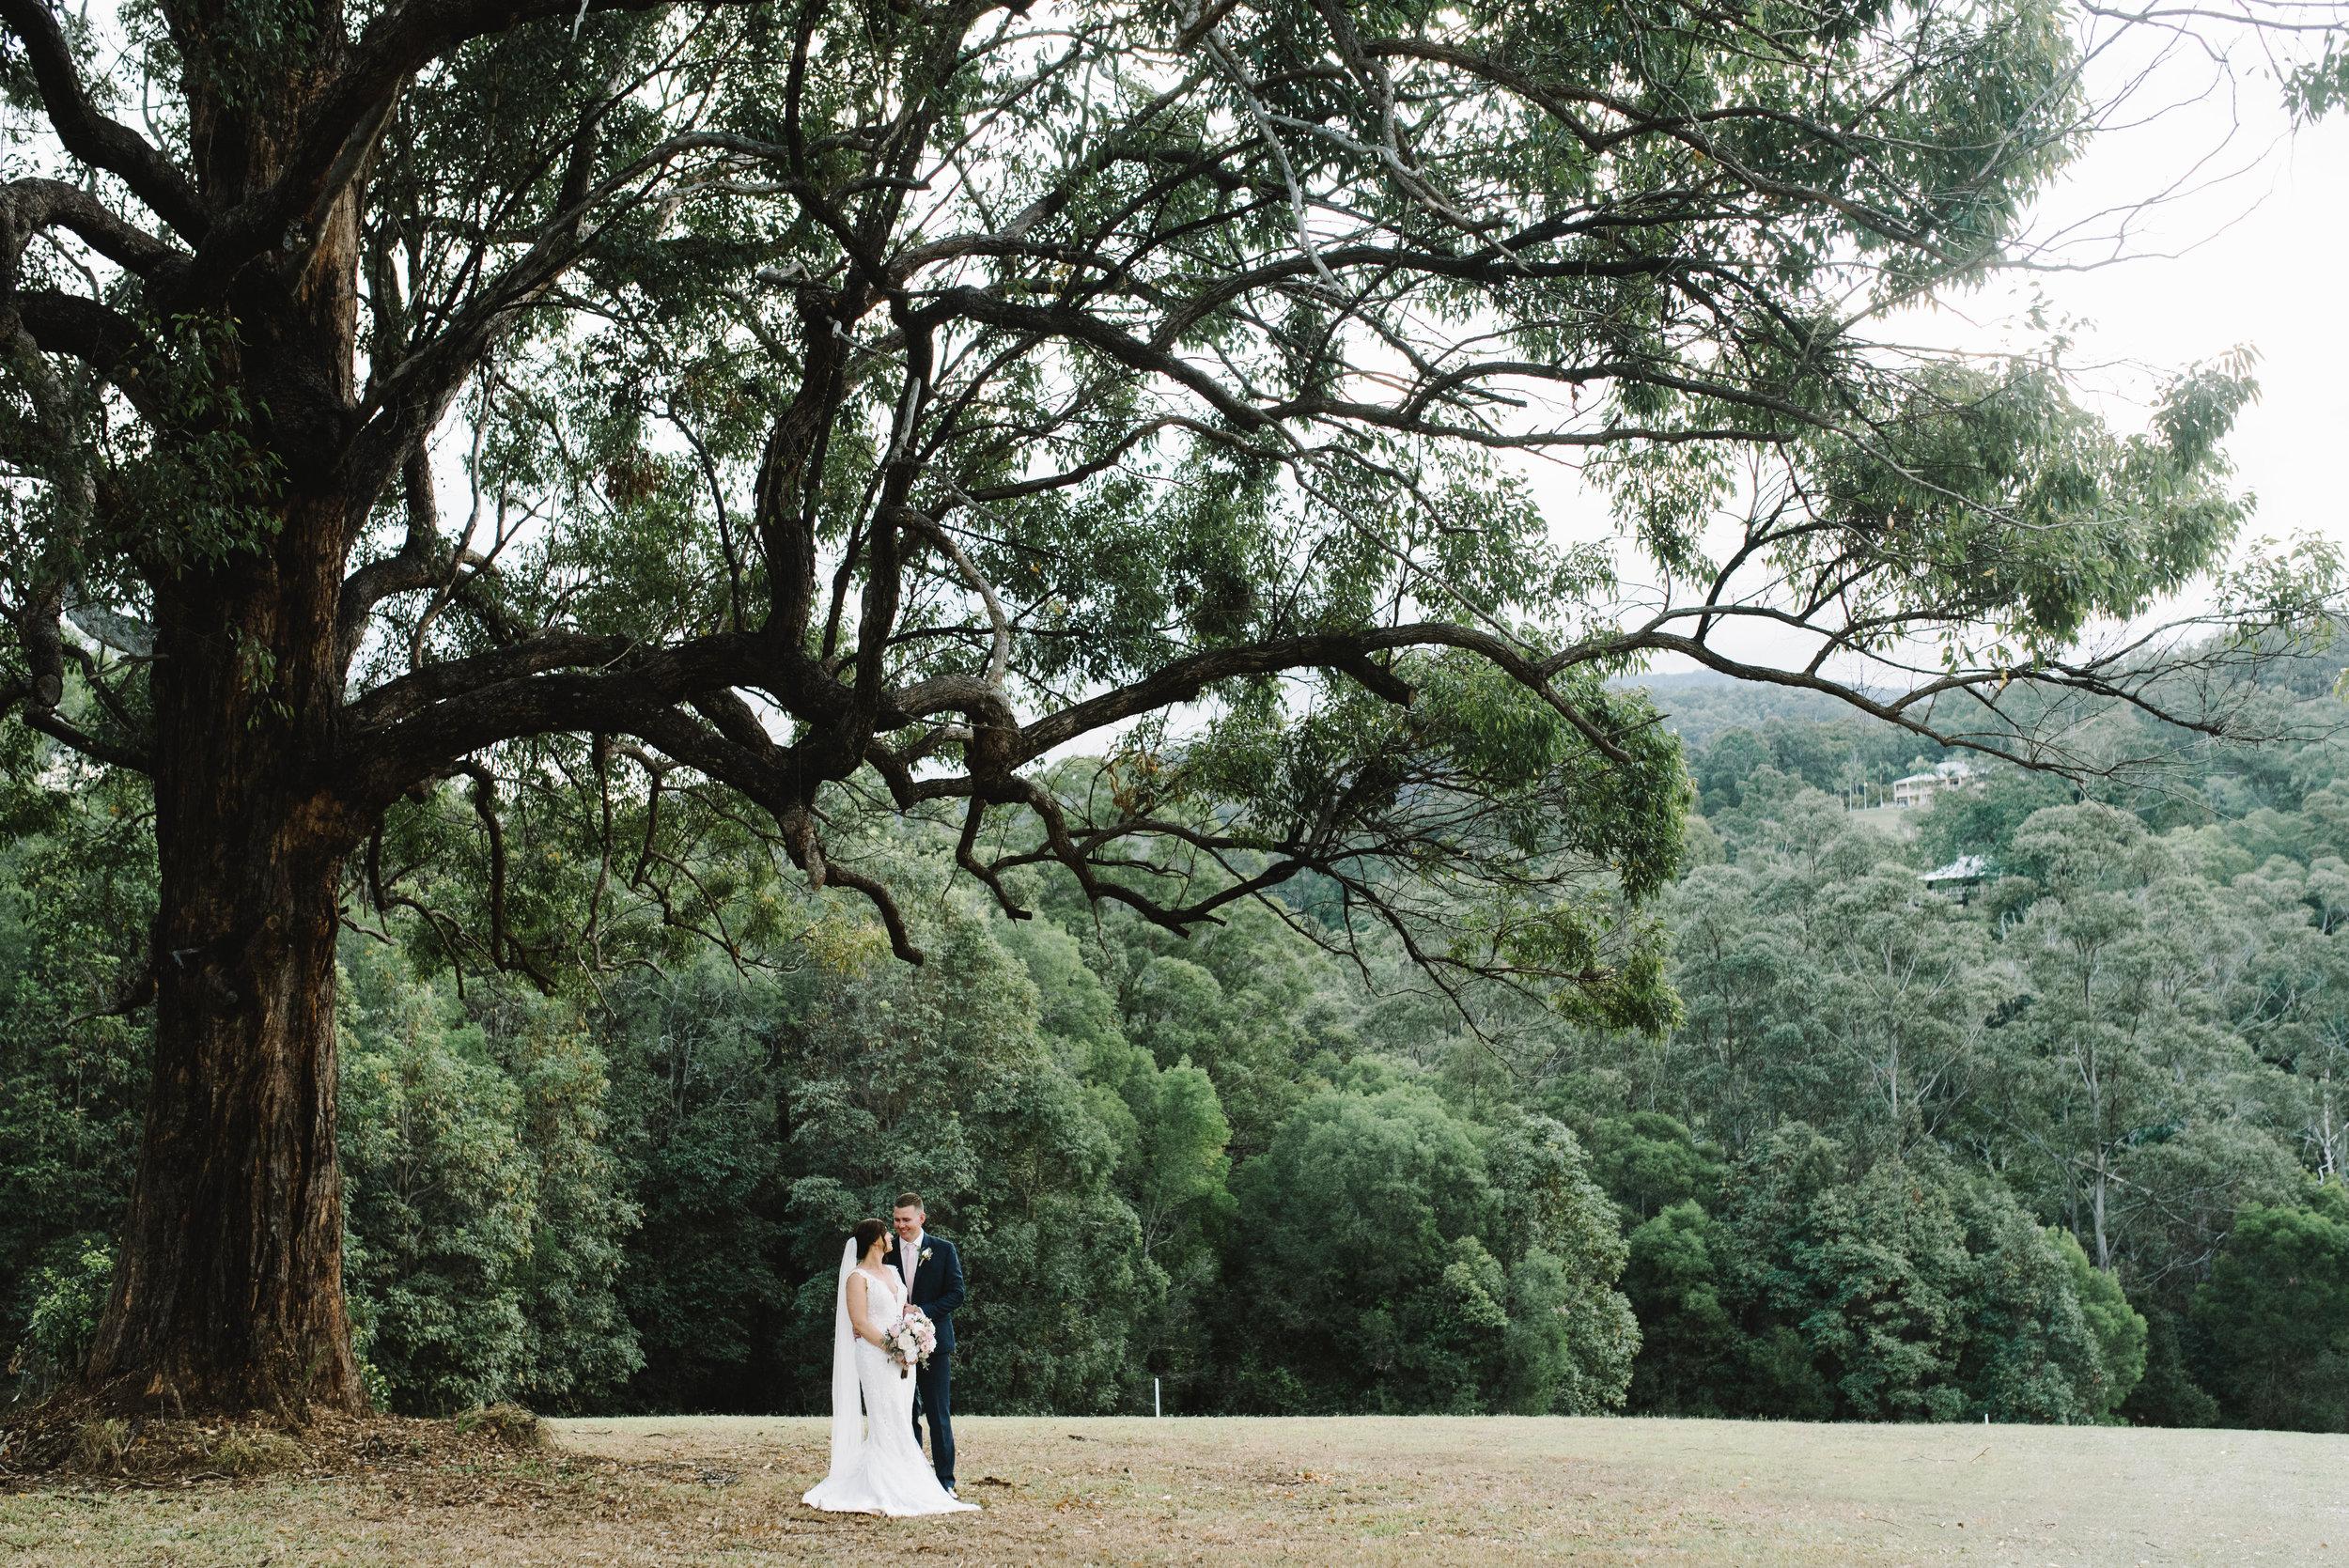 LAURENOLIVIA-austinvilla-estate-wedding-64.jpg